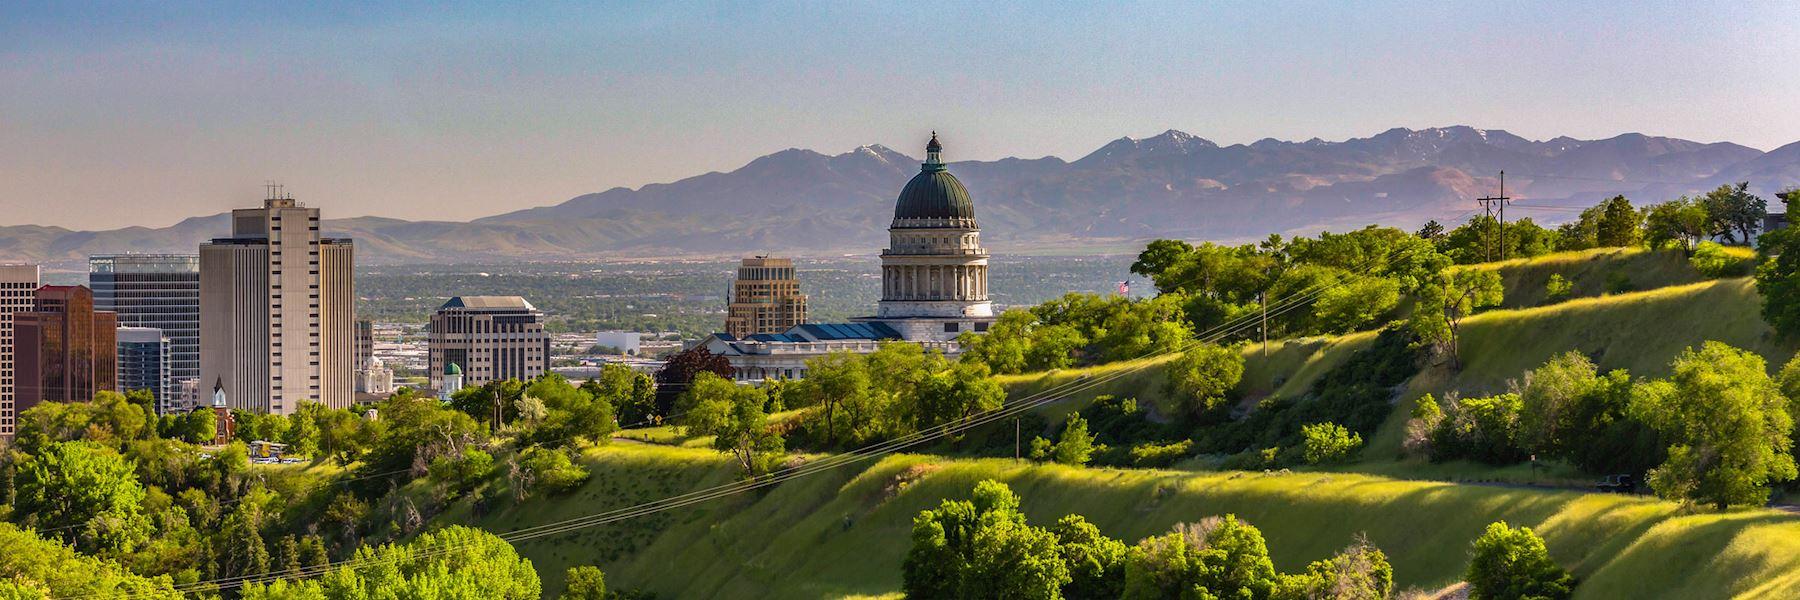 Visit Salt Lake City, USA